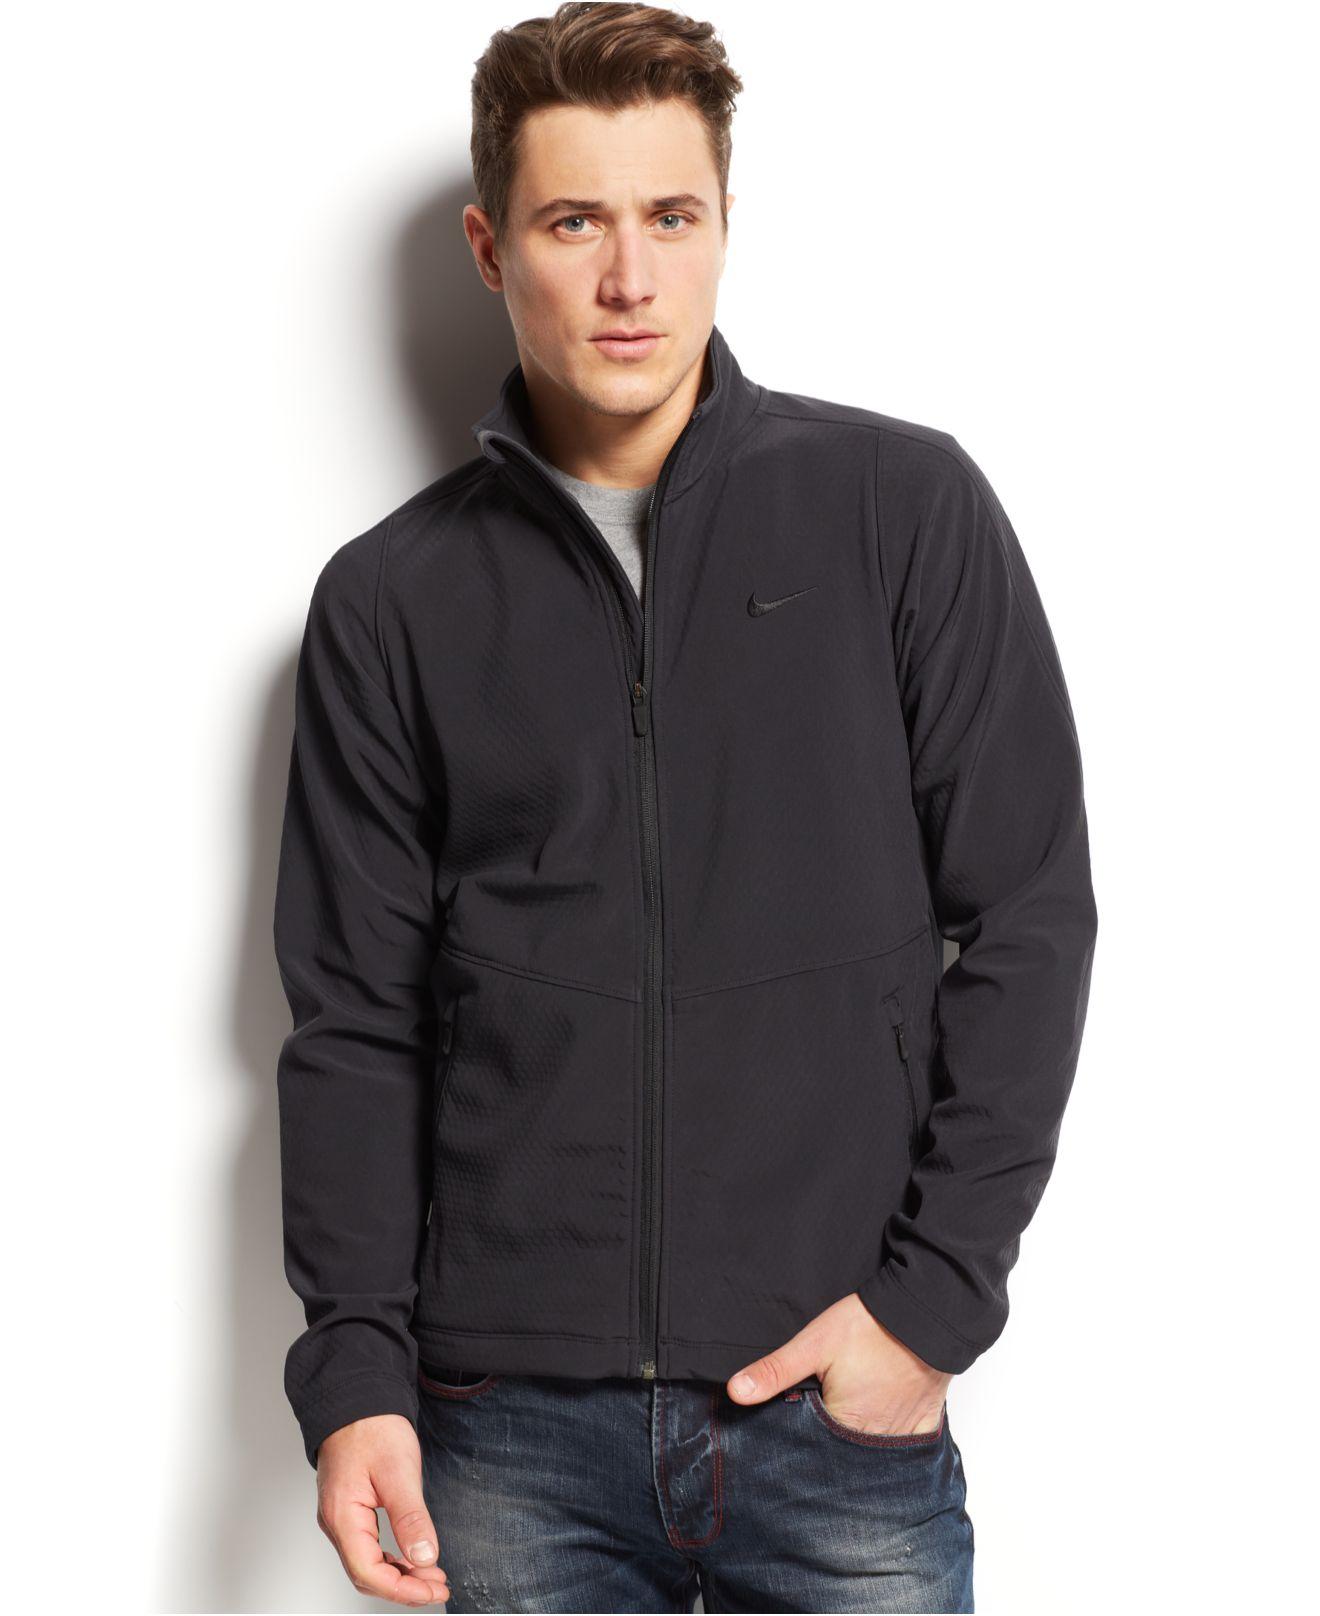 e236838cb795 Lyst - Nike Max Softshell Jacket in Black for Men